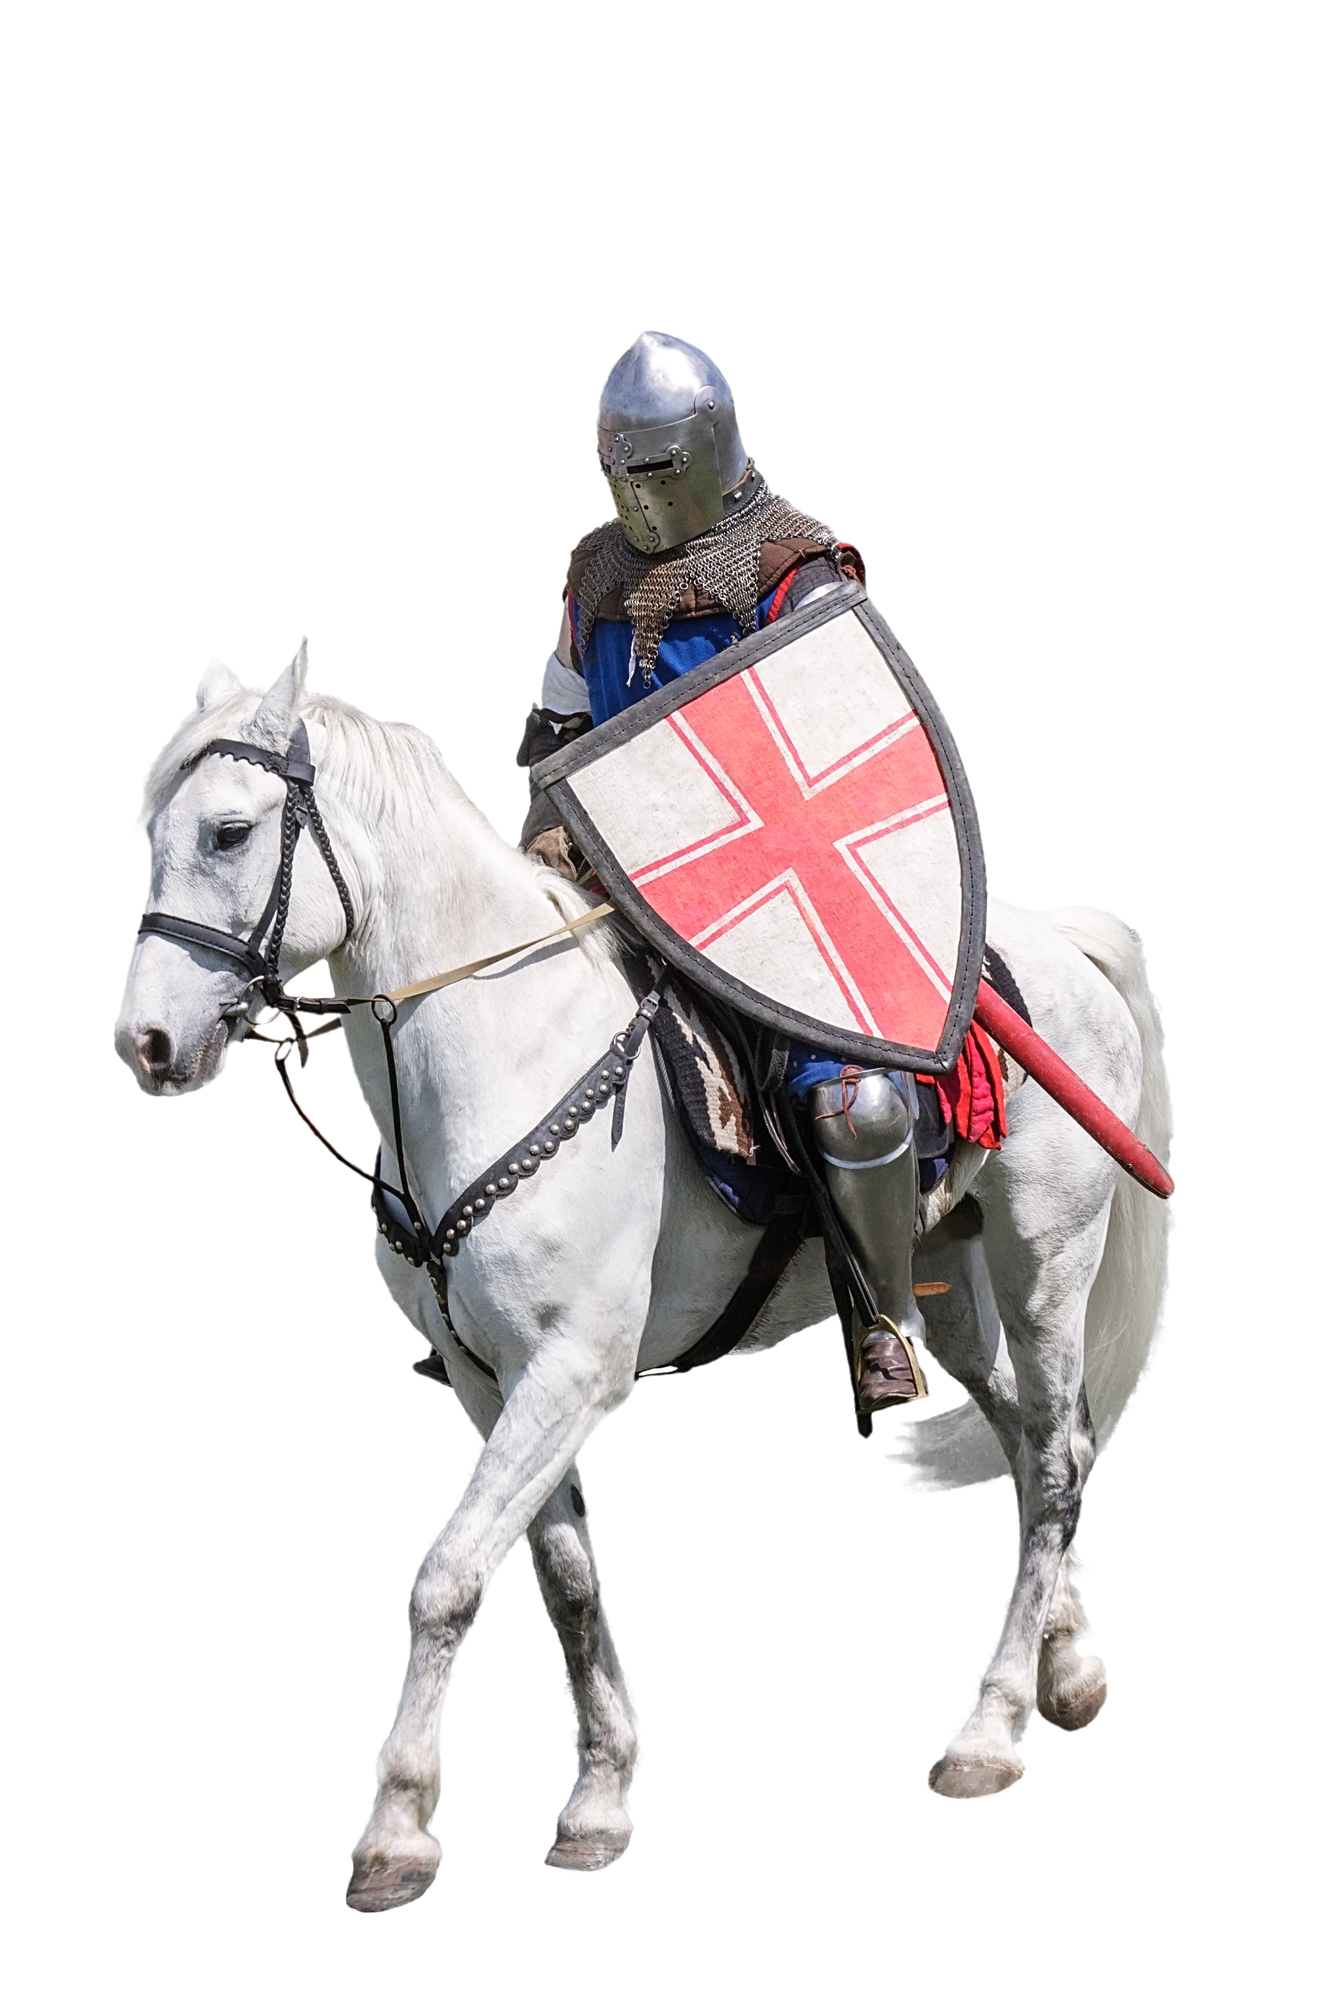 Armoured knight on white warhorse